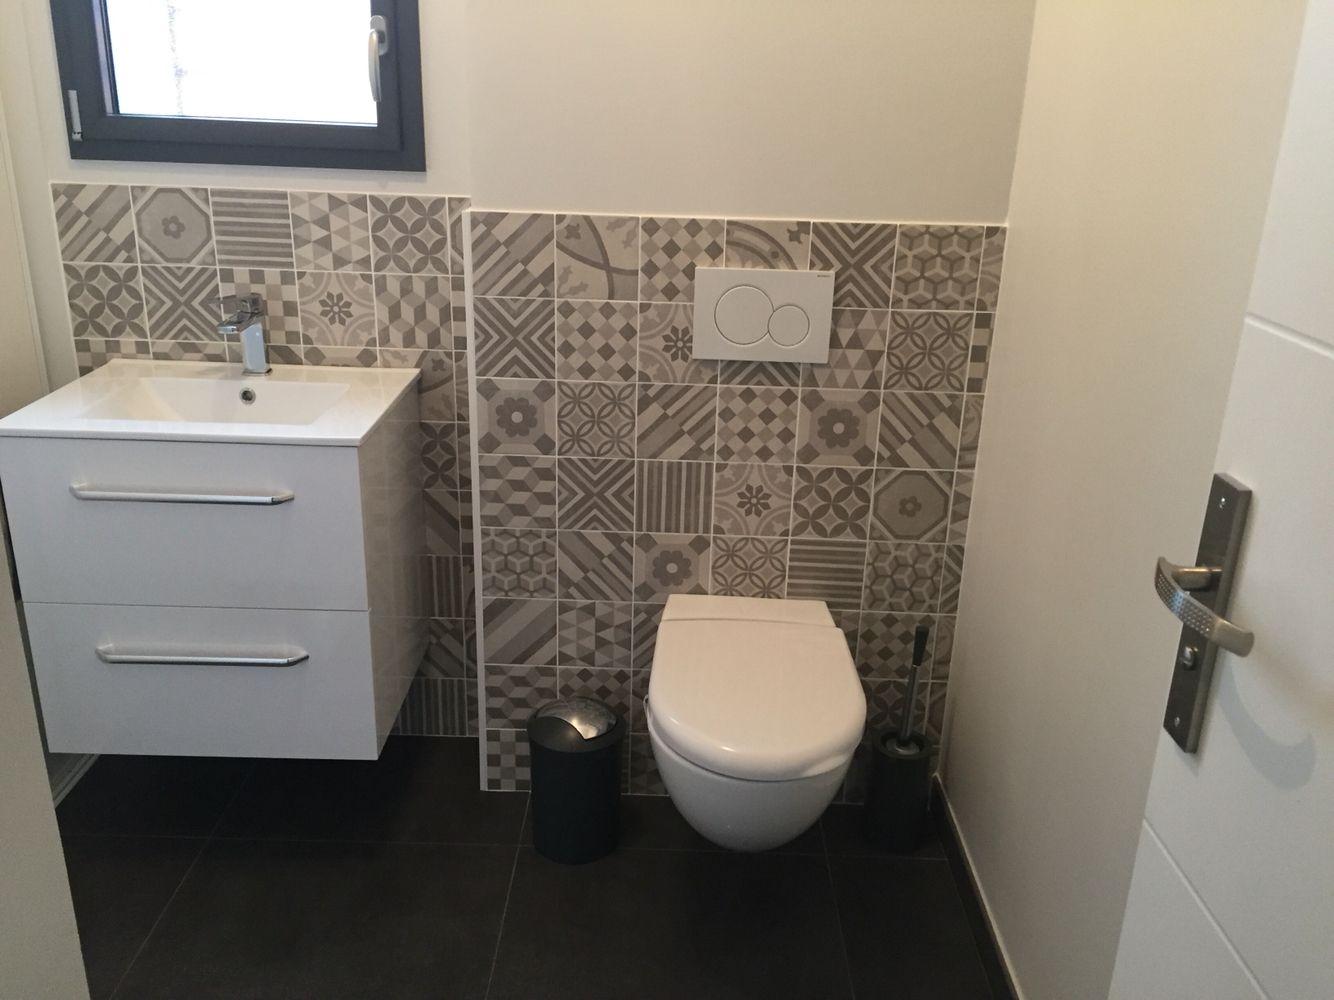 toilette carreaux ciment leroy merlin idee architecte. Black Bedroom Furniture Sets. Home Design Ideas